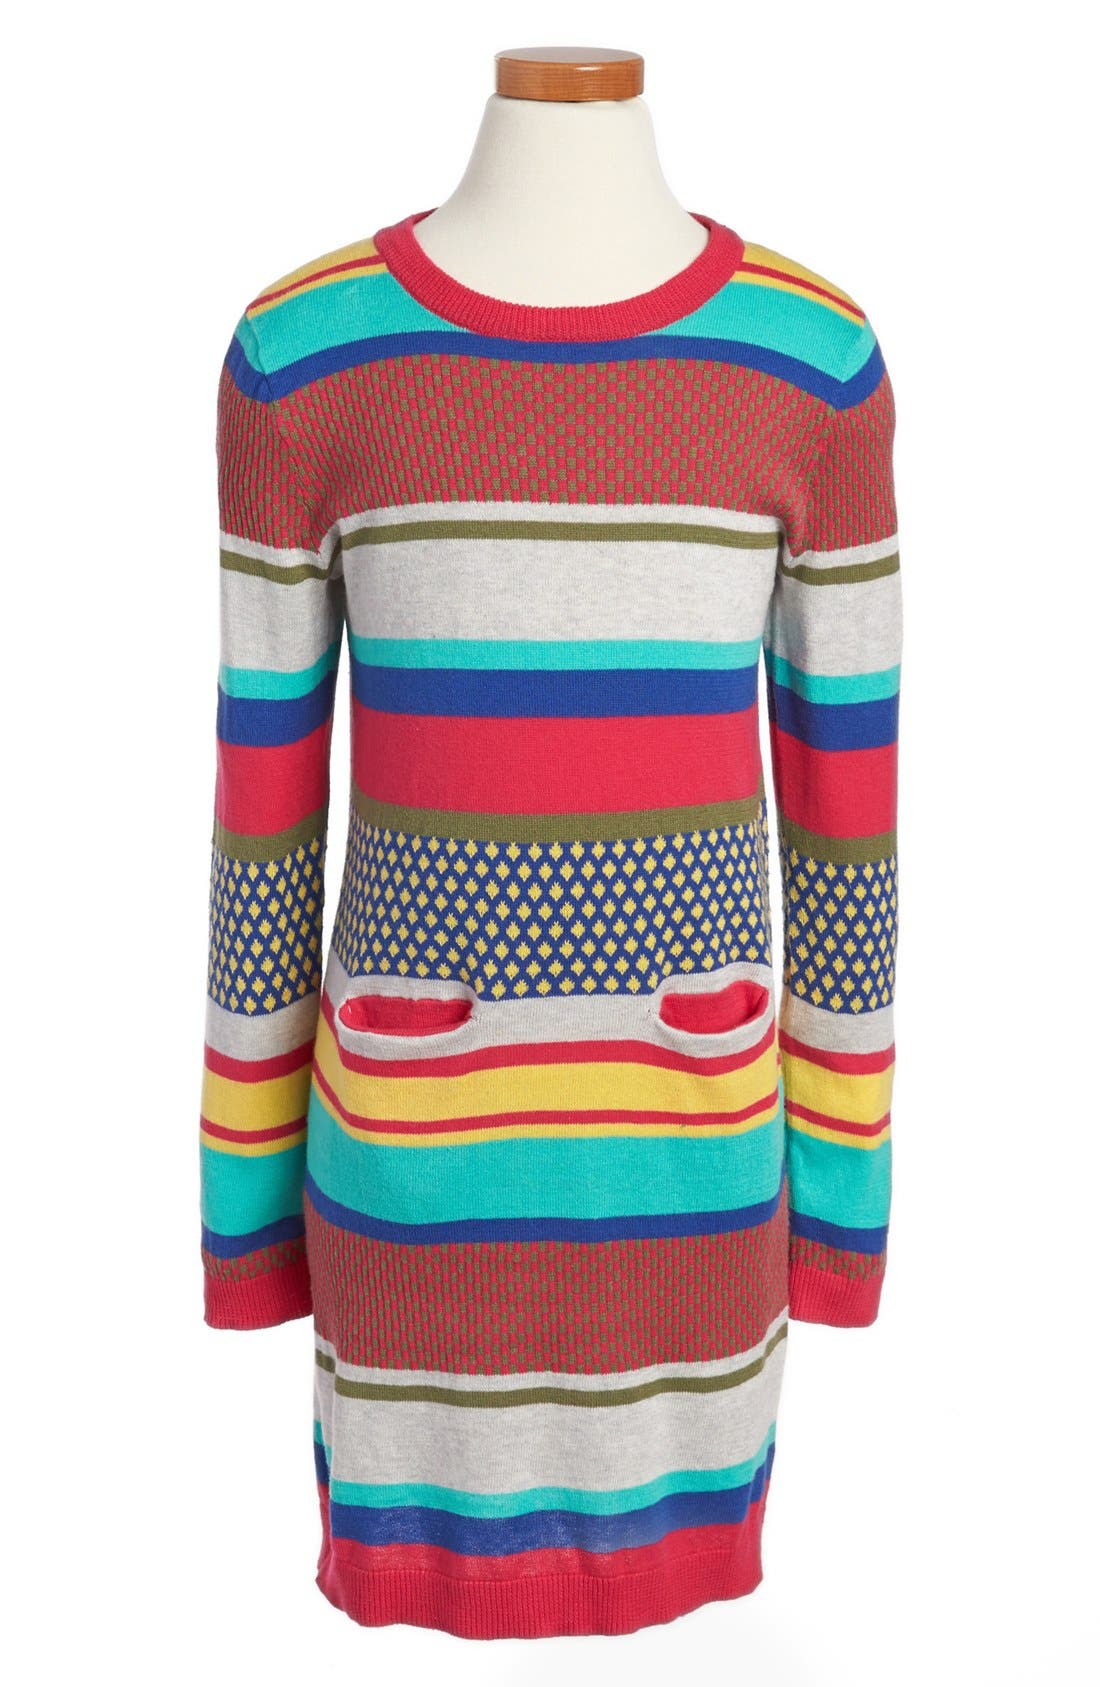 Alternate Image 1 Selected - Tucker + Tate 'Chantel' Jacquard Knit Dress (Little Girls & Big Girls)